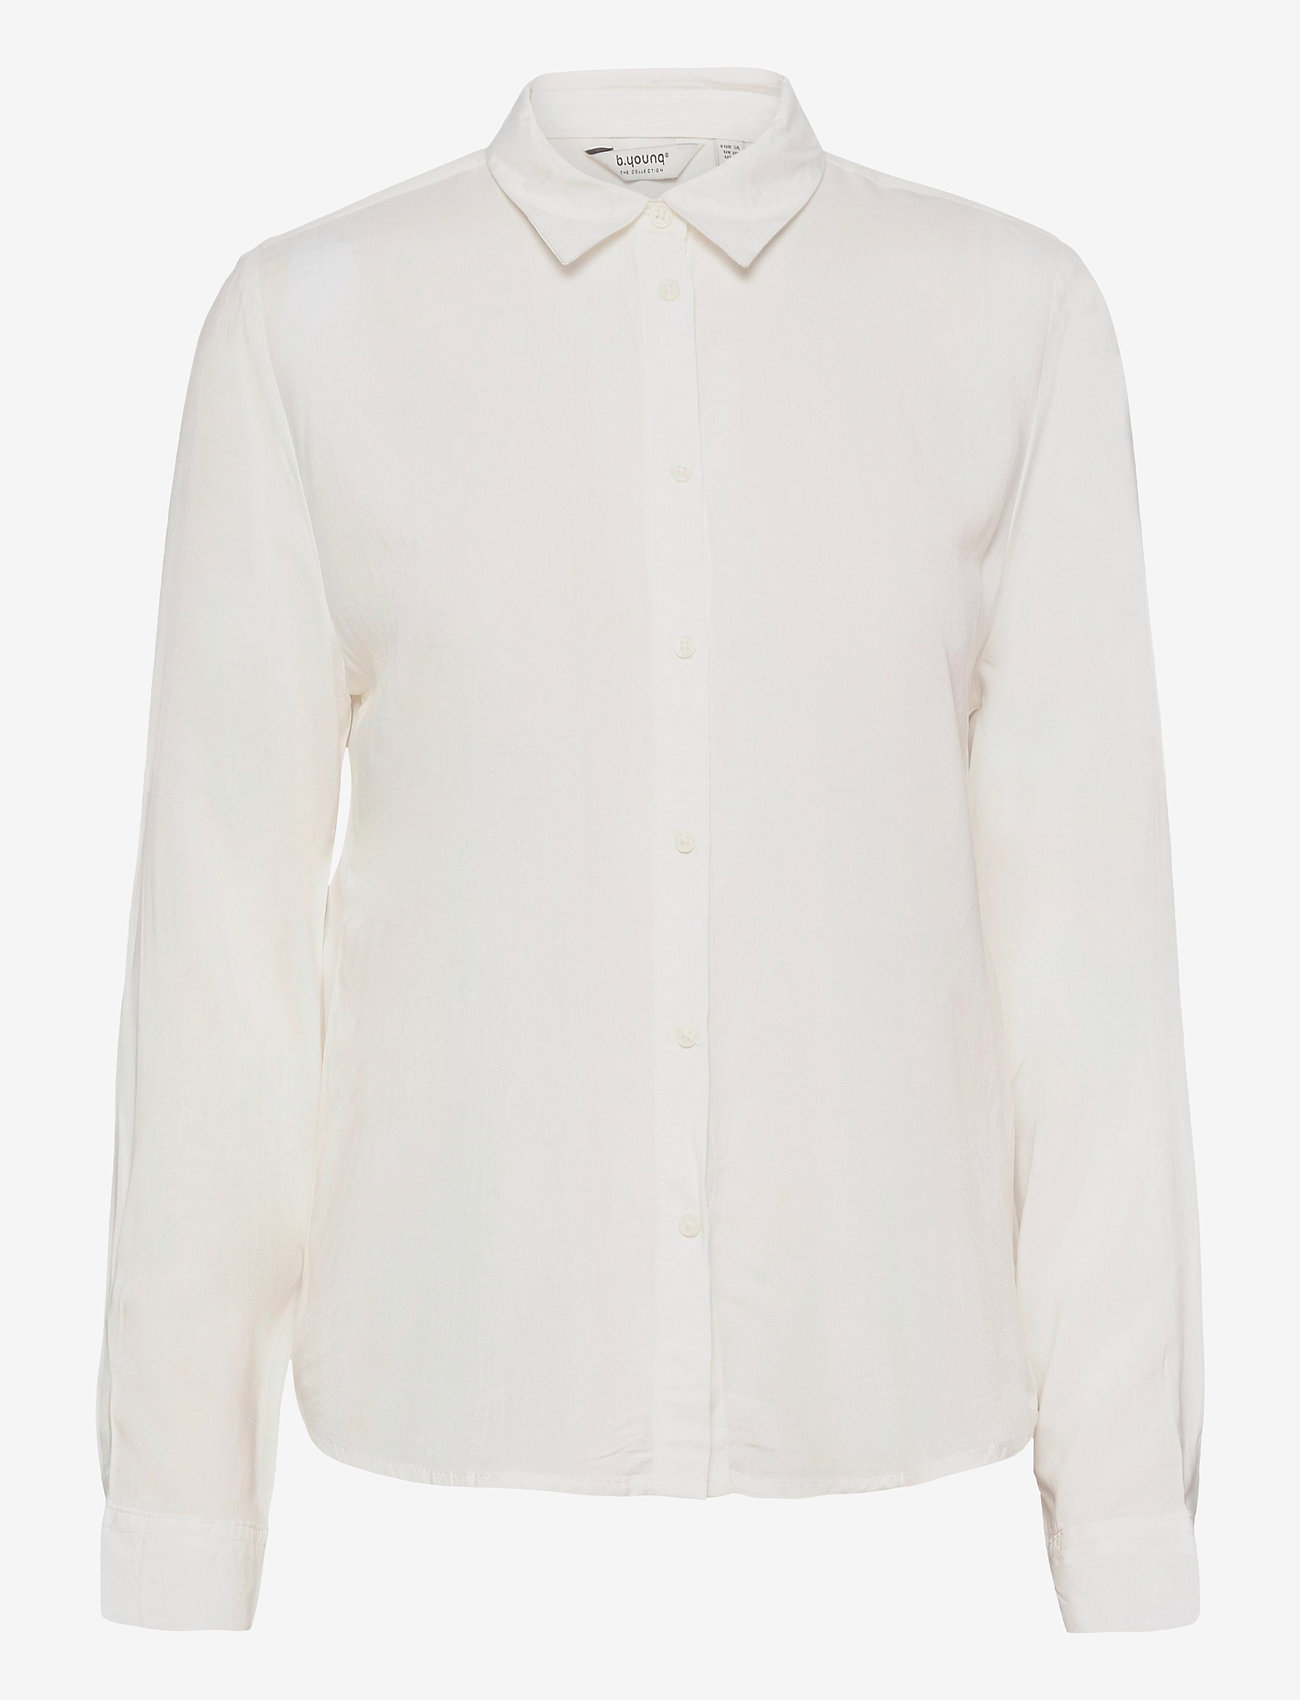 b.young - BYIDRA SHIRT - - long-sleeved shirts - off white - 0